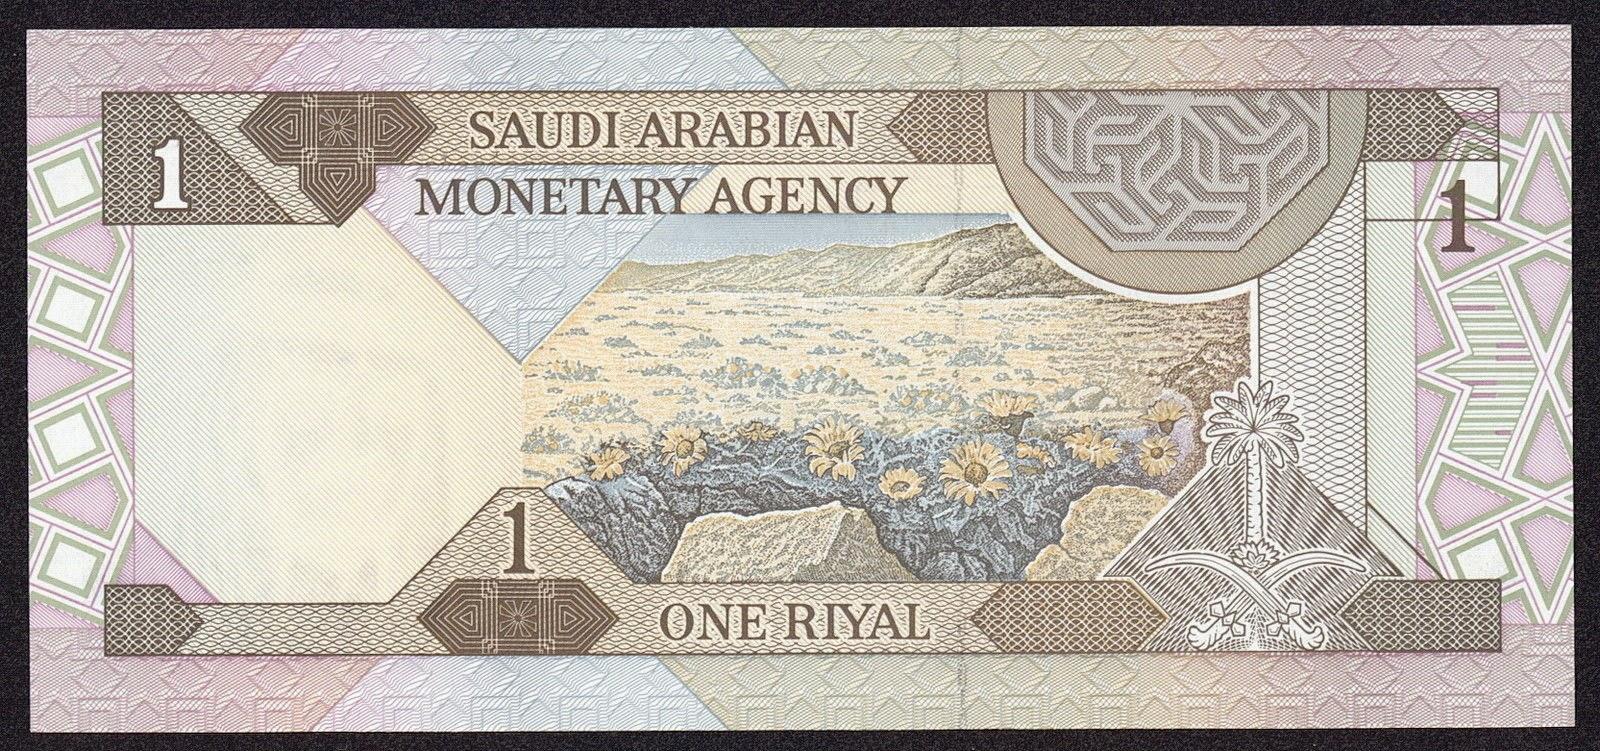 Saudi Arabia money currency 1 Riyal Note 1984